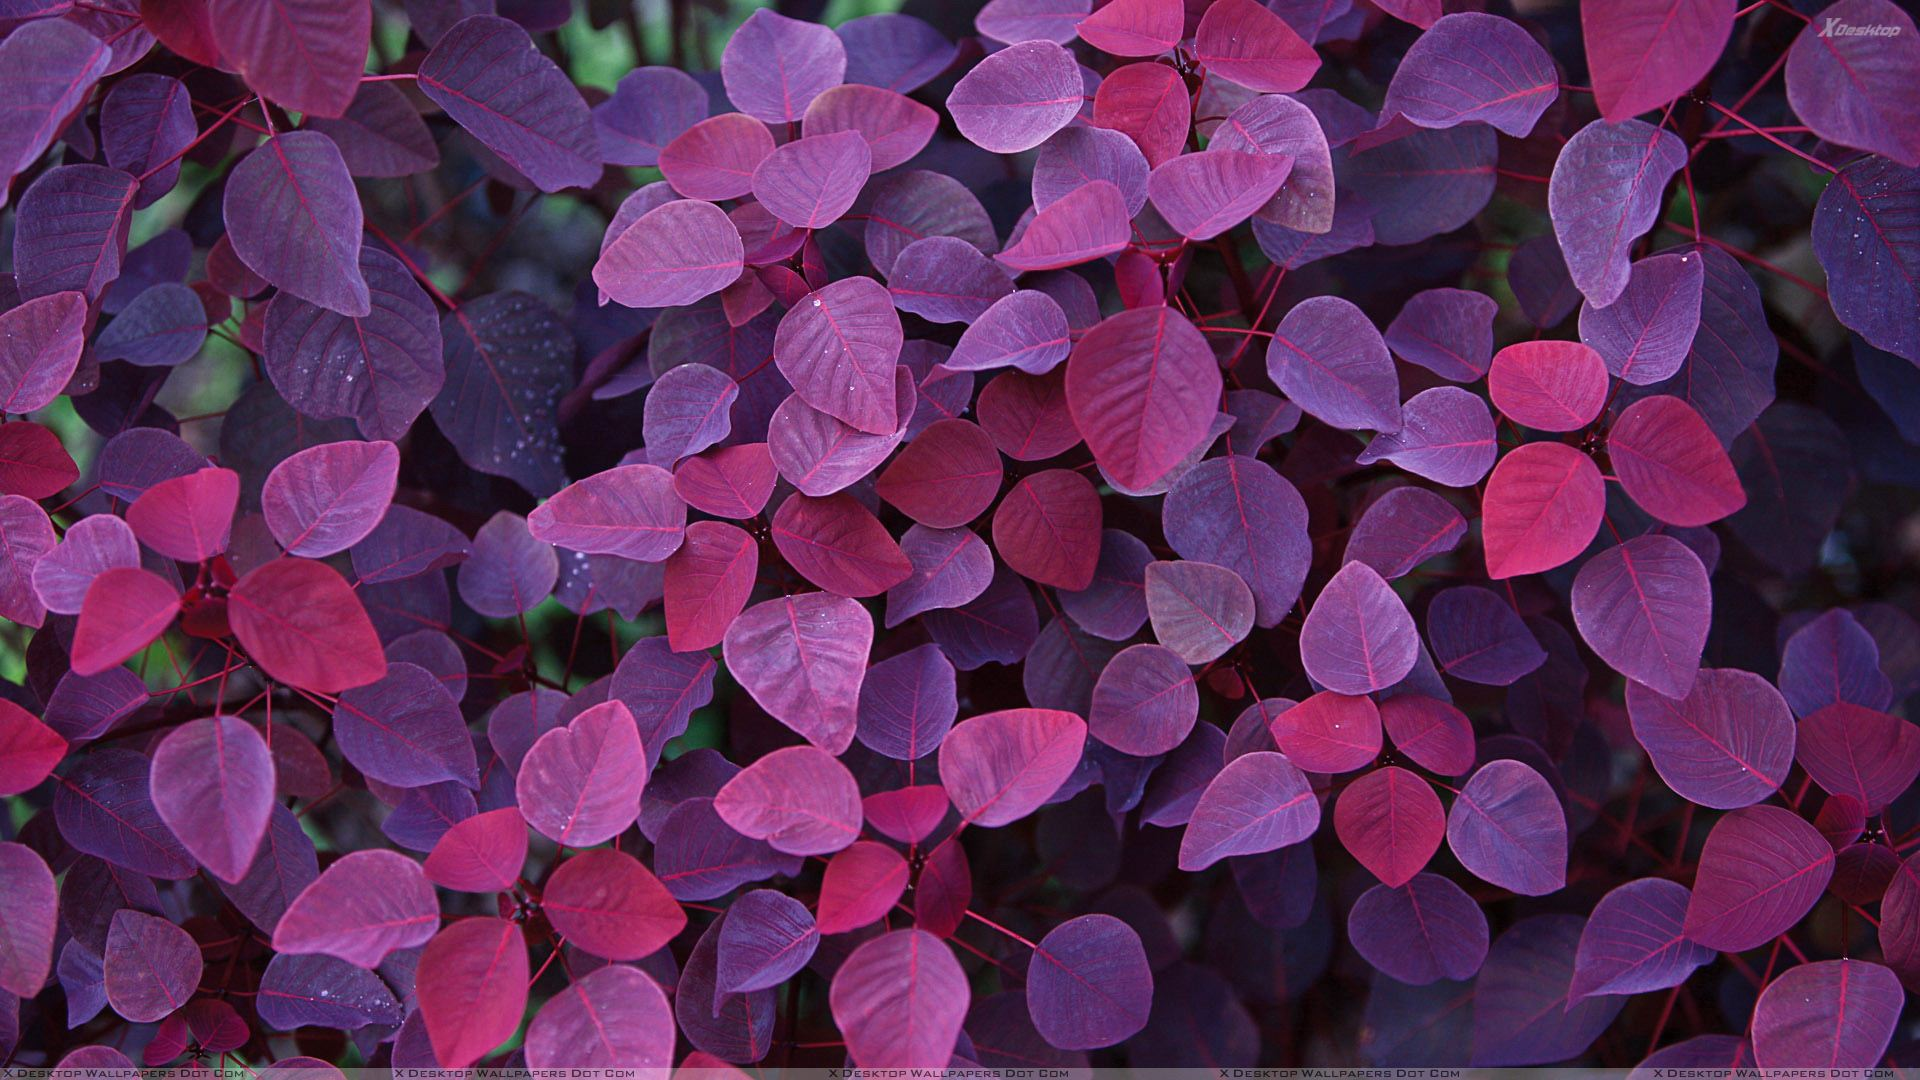 Pink Leaves Closeup Wallpaper